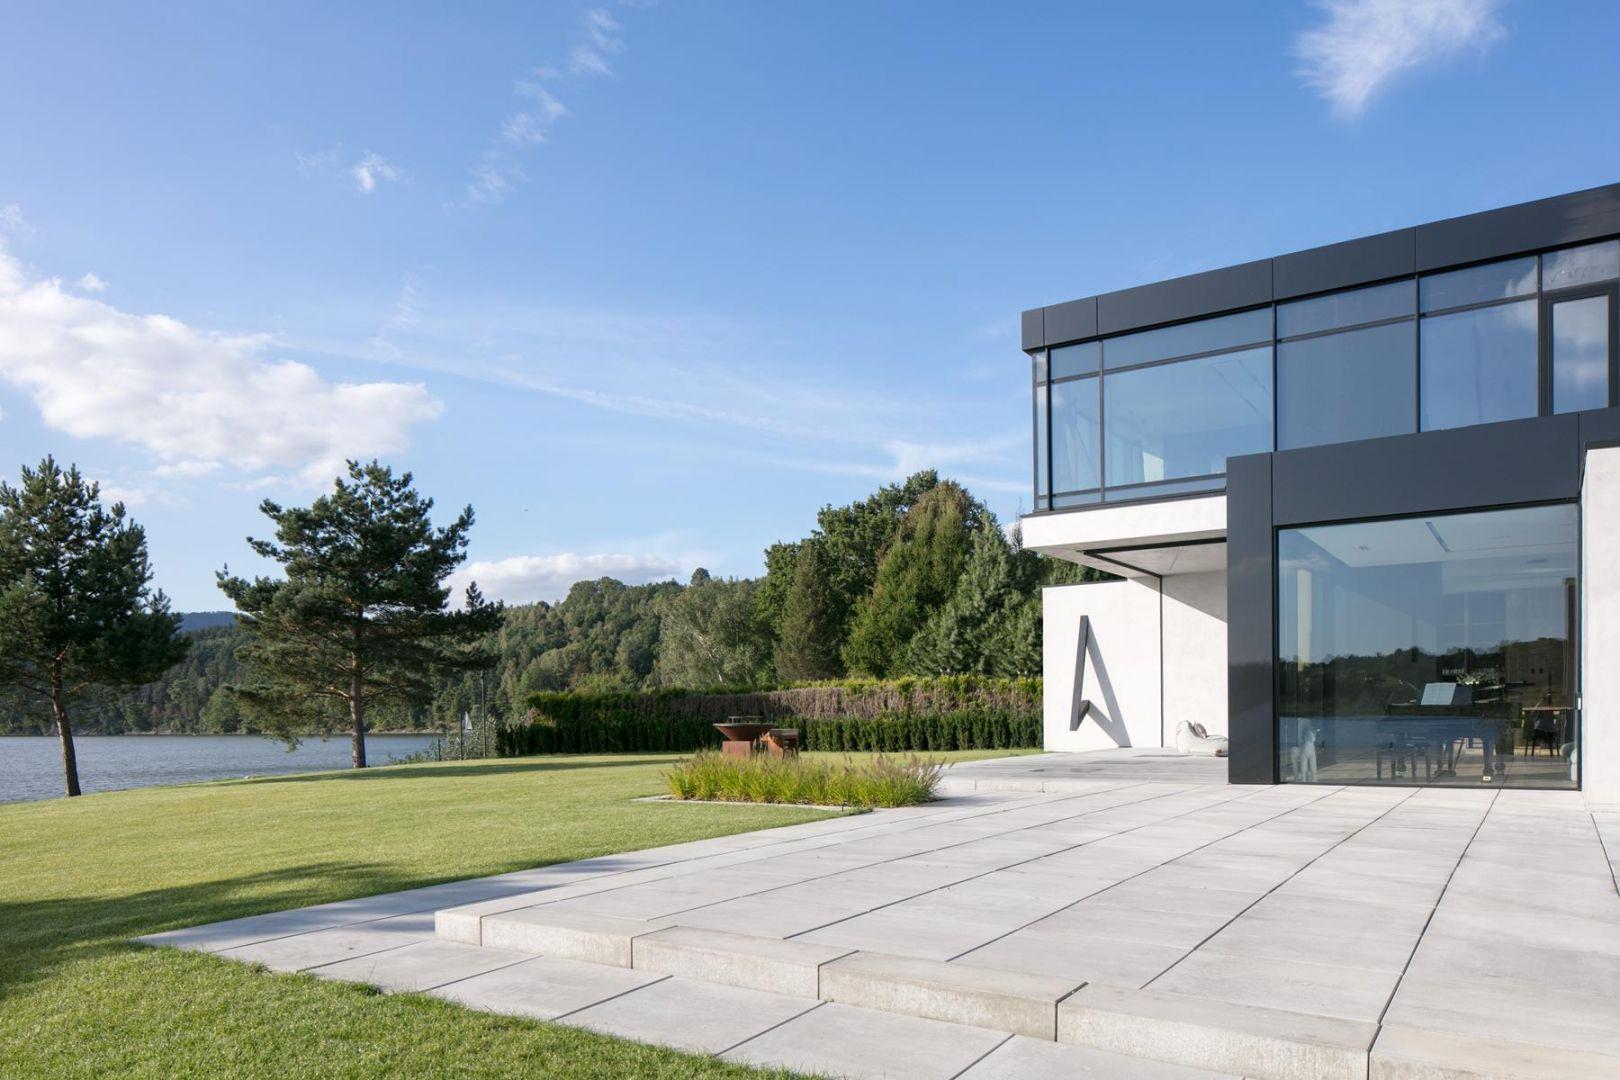 Lakeside House. Projekt: Marcin Tomaszewski, pracownia REFORM Architekt